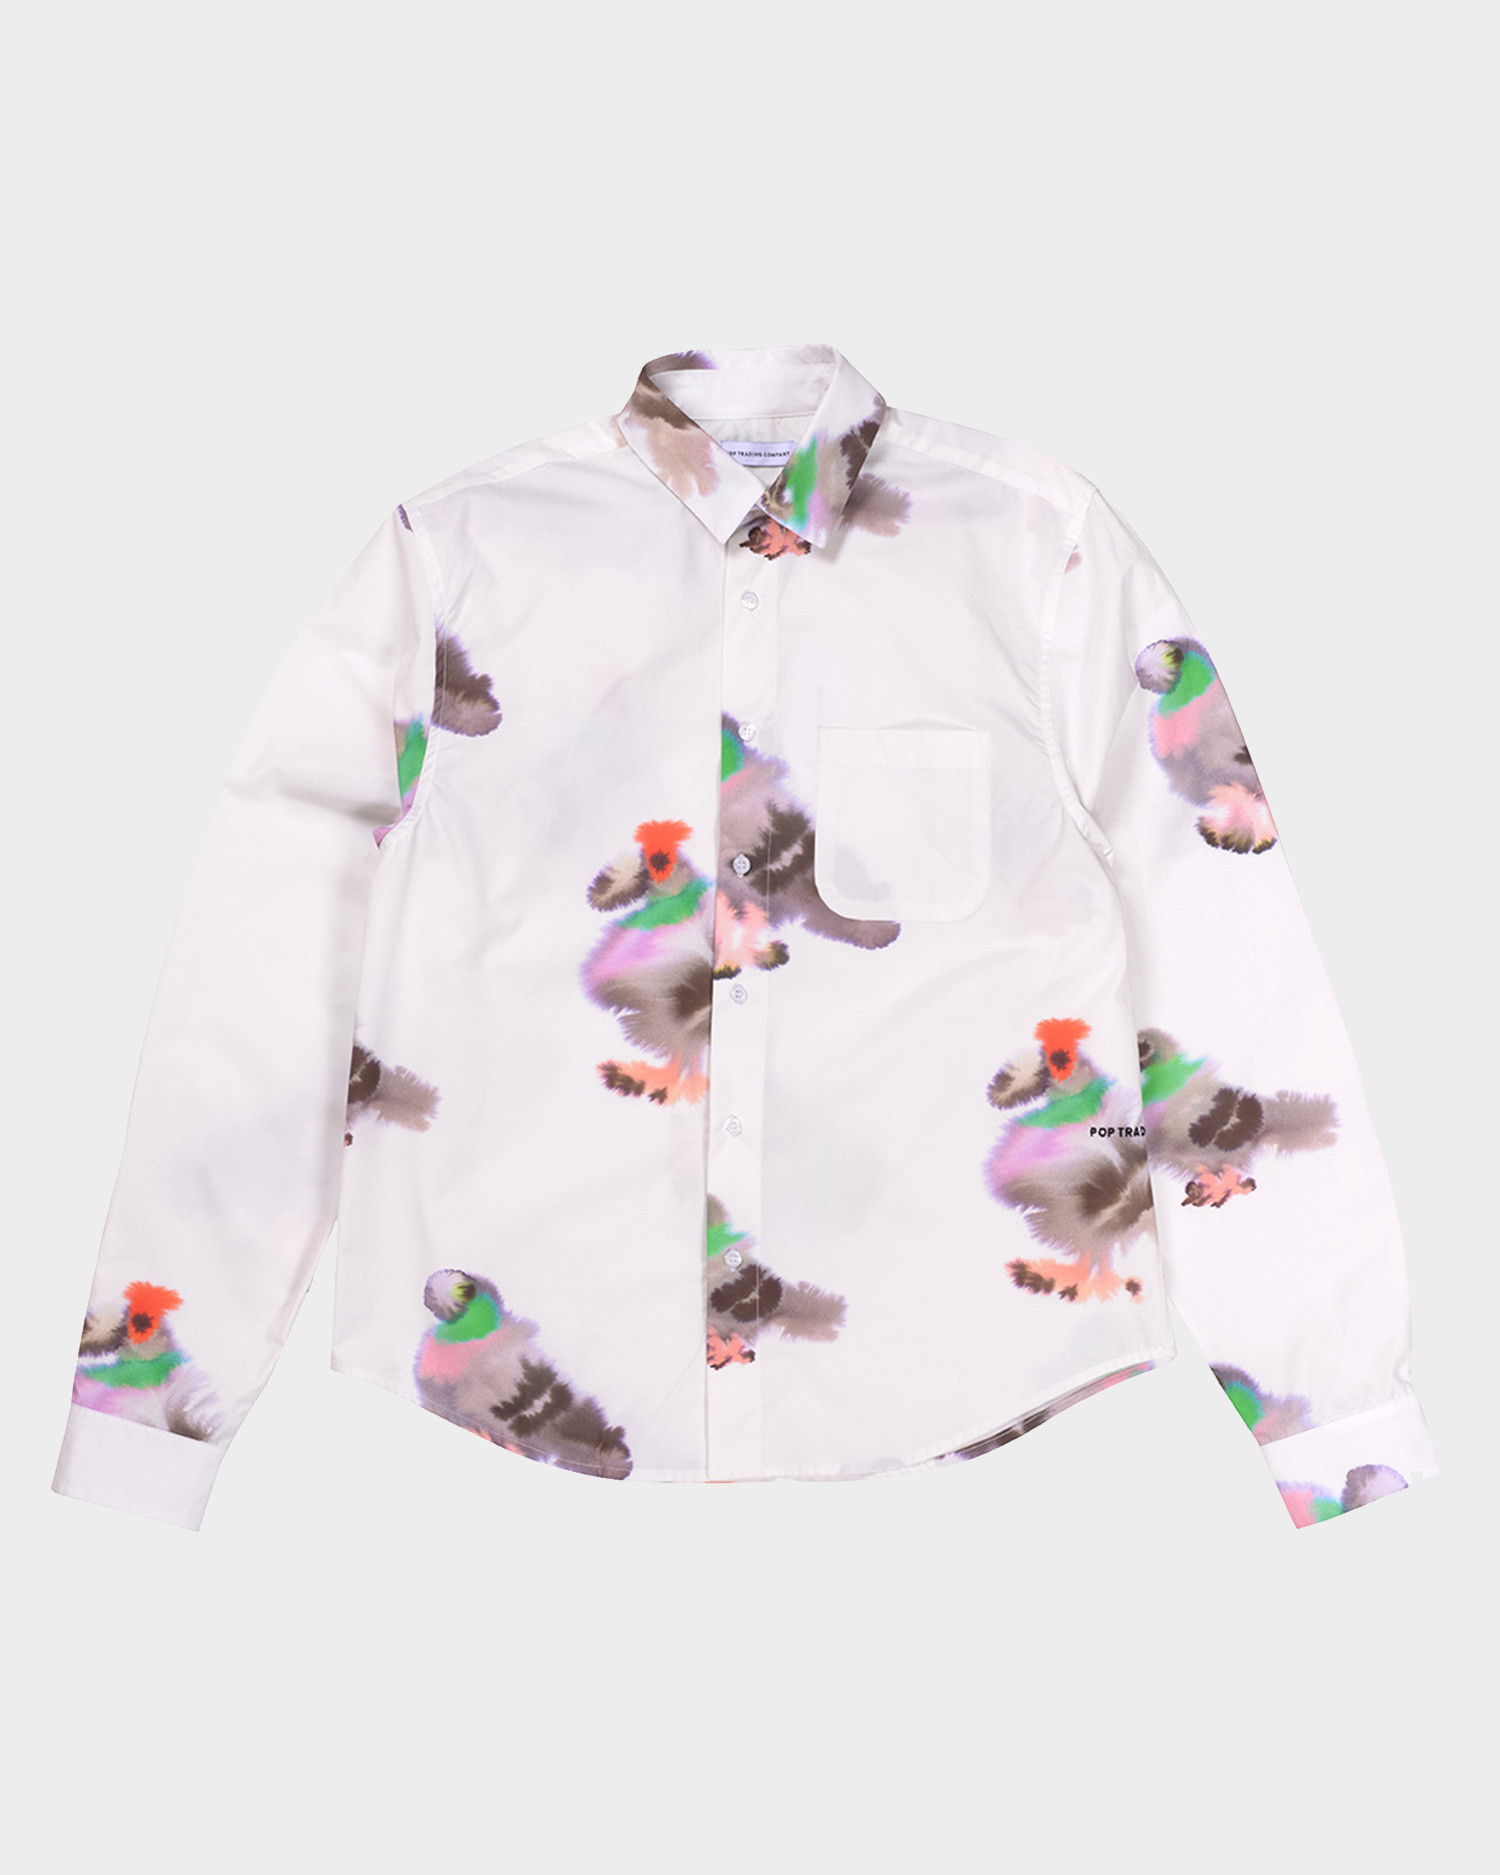 Pop Trading Company Pigeon Shirt